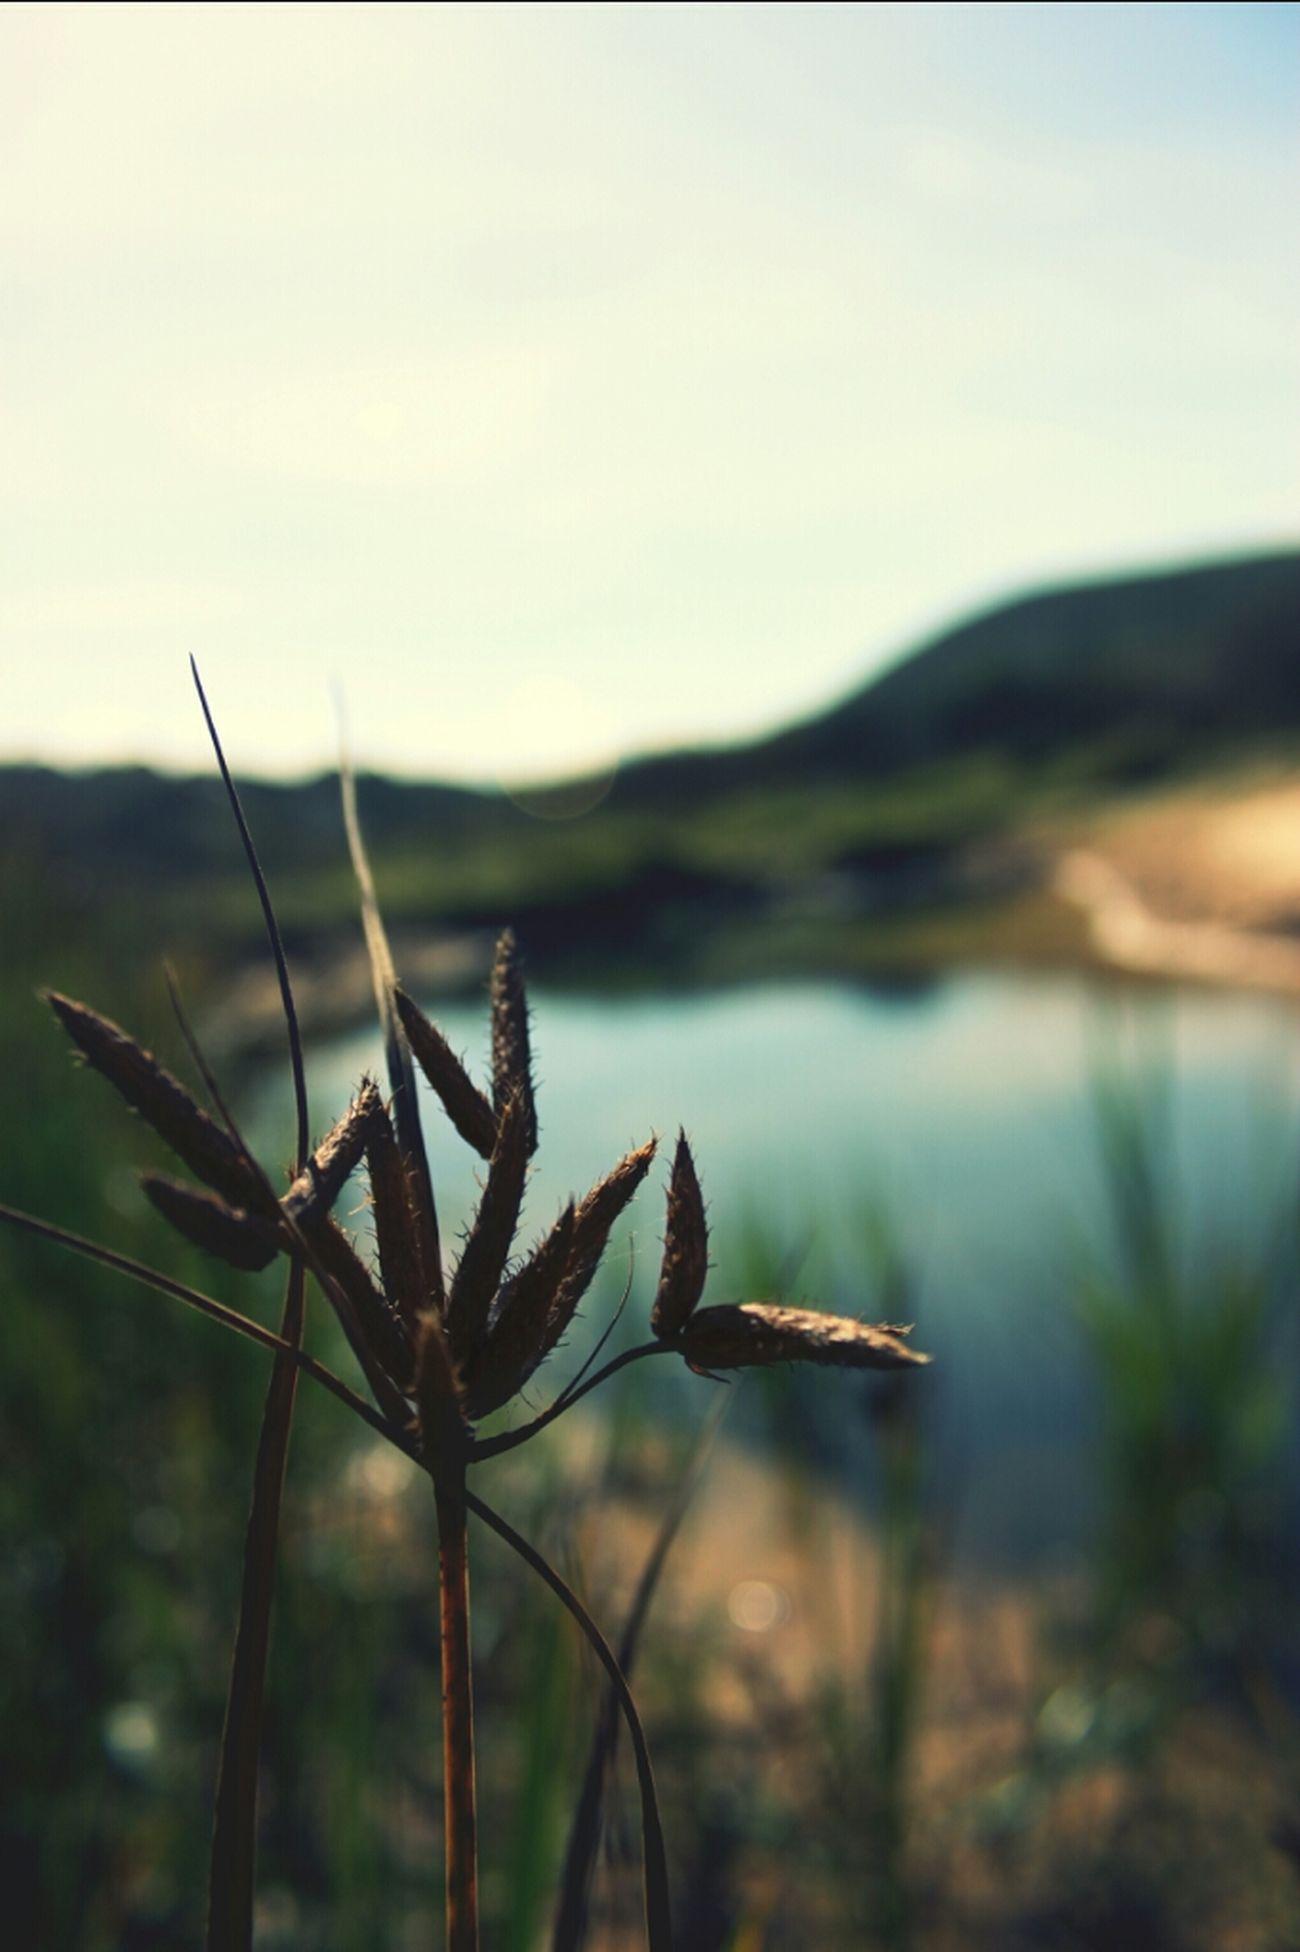 Nature Taking Photos Colors WeAreJuxt.com Plants Lake Shootermag Priceless EyeEm Nature Lover